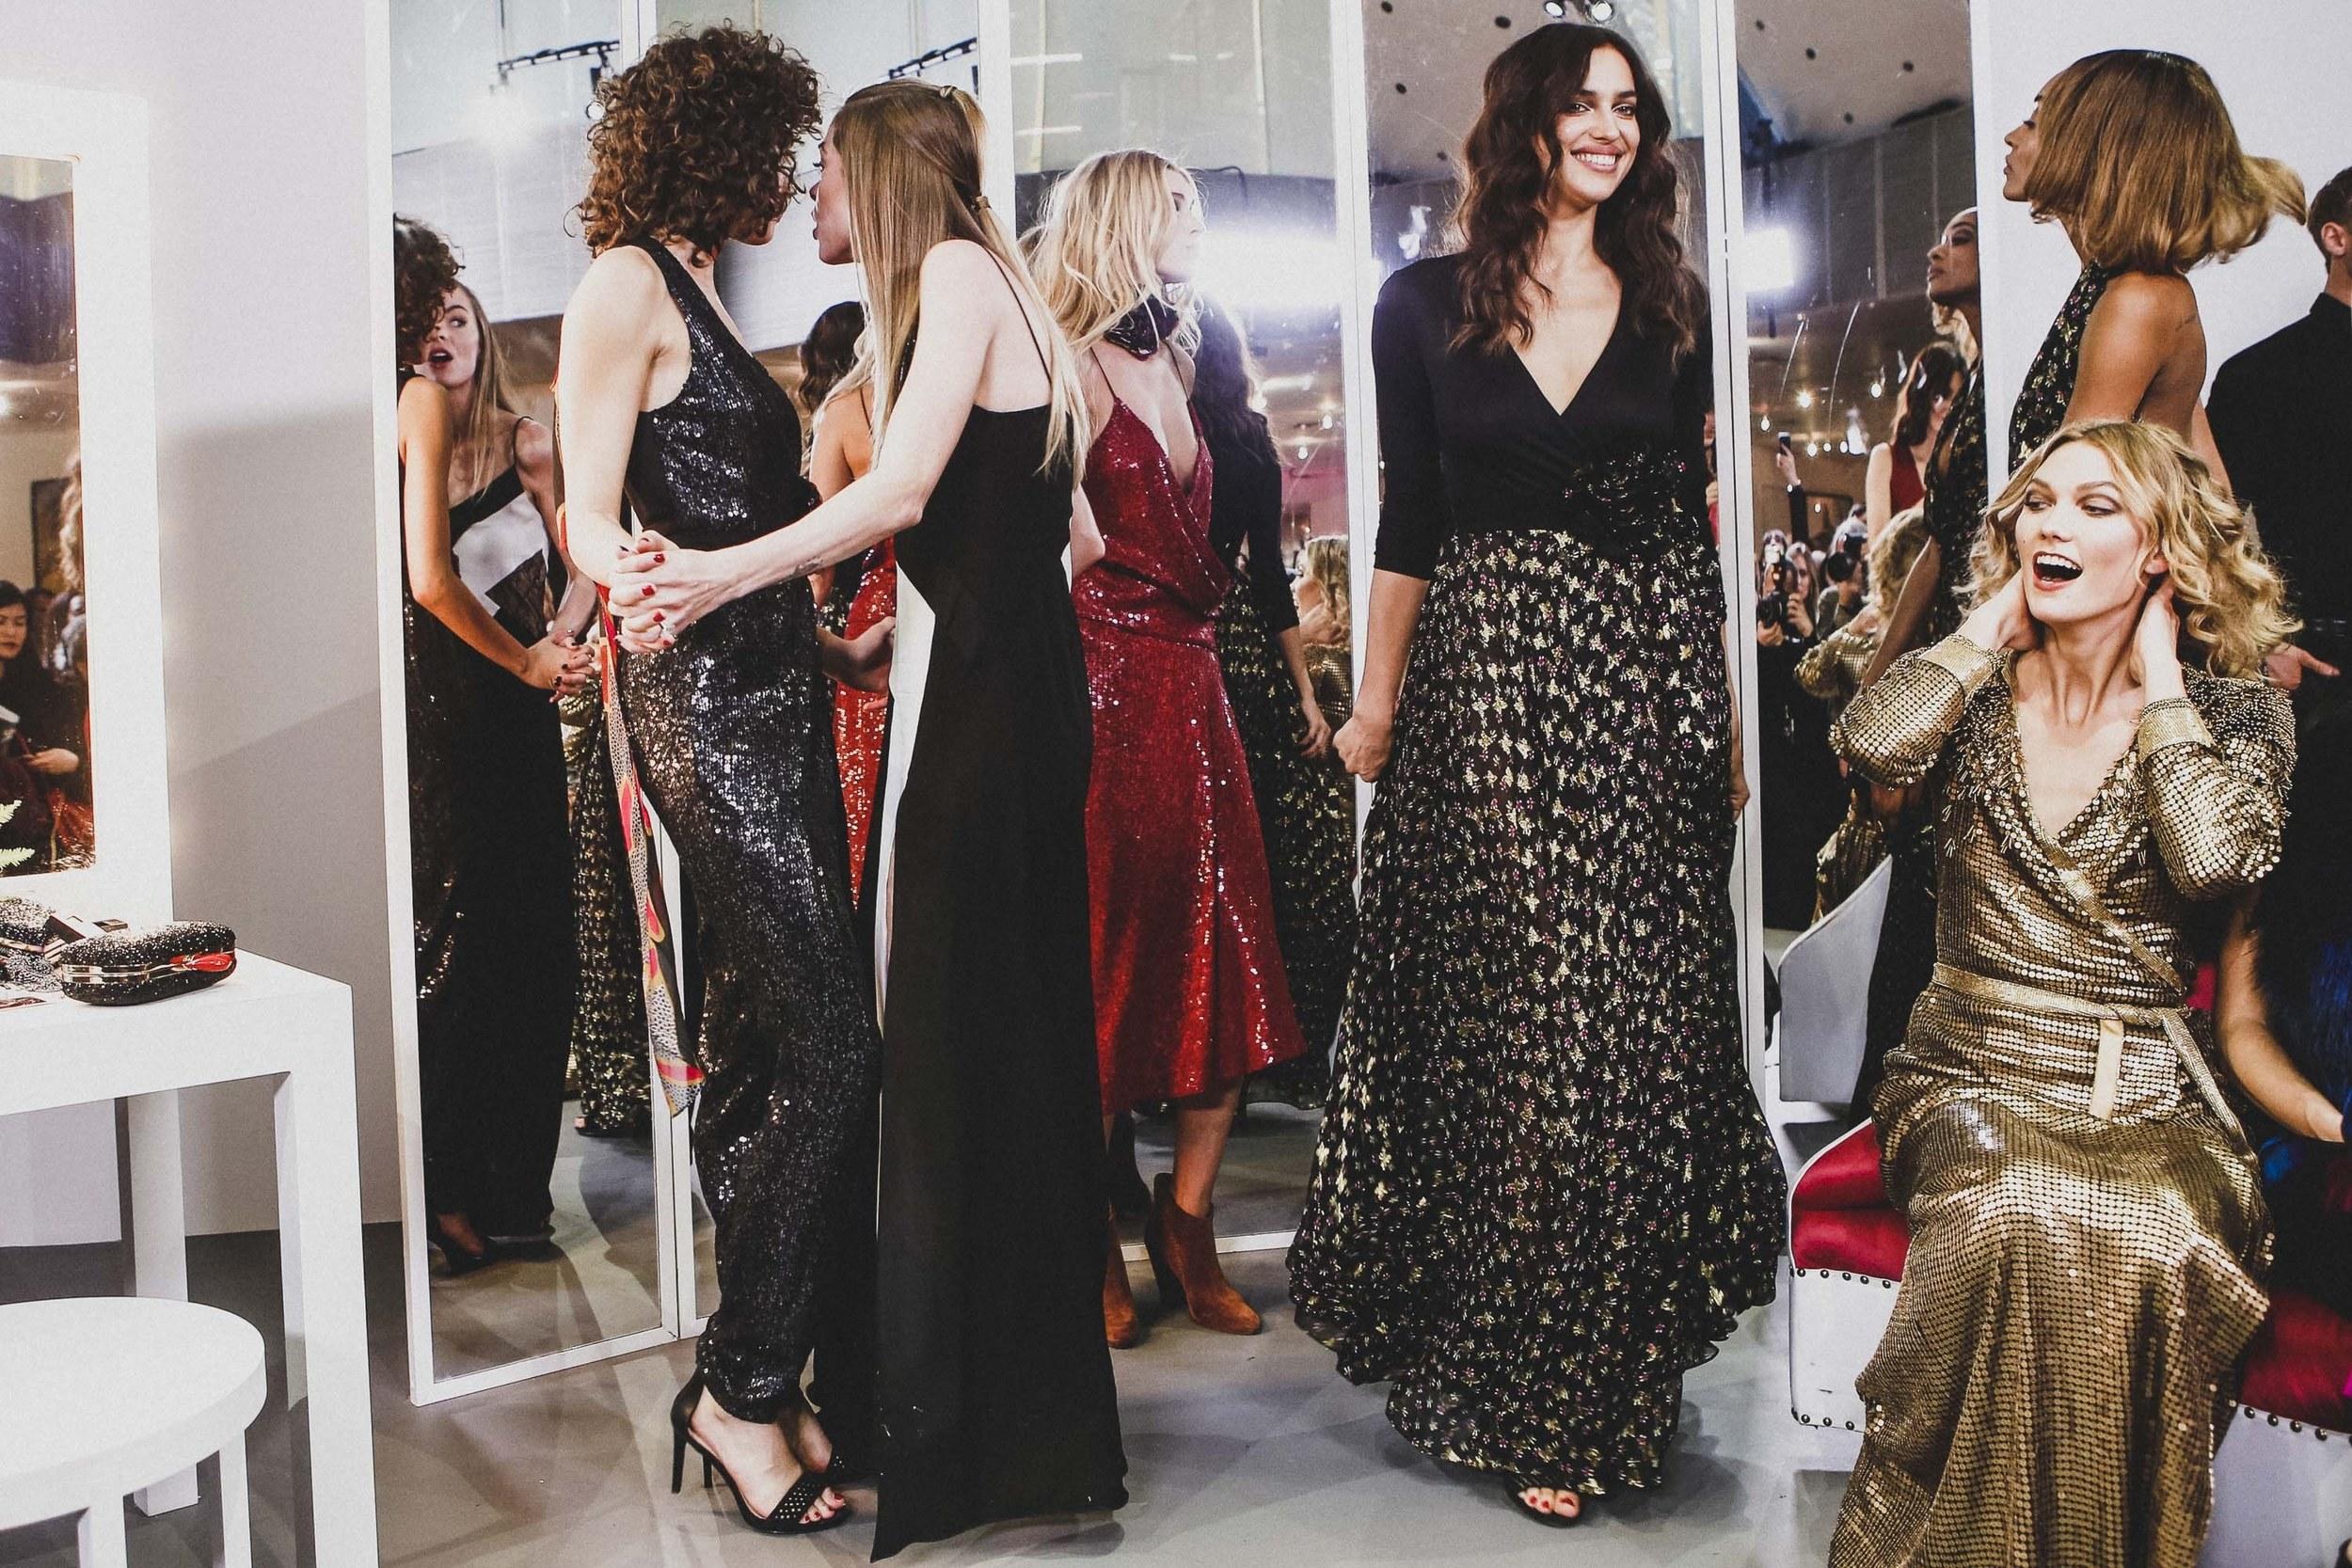 Supermodels Irina Shayk and Karlie Kloss flaunting their DVF frocks; image  via